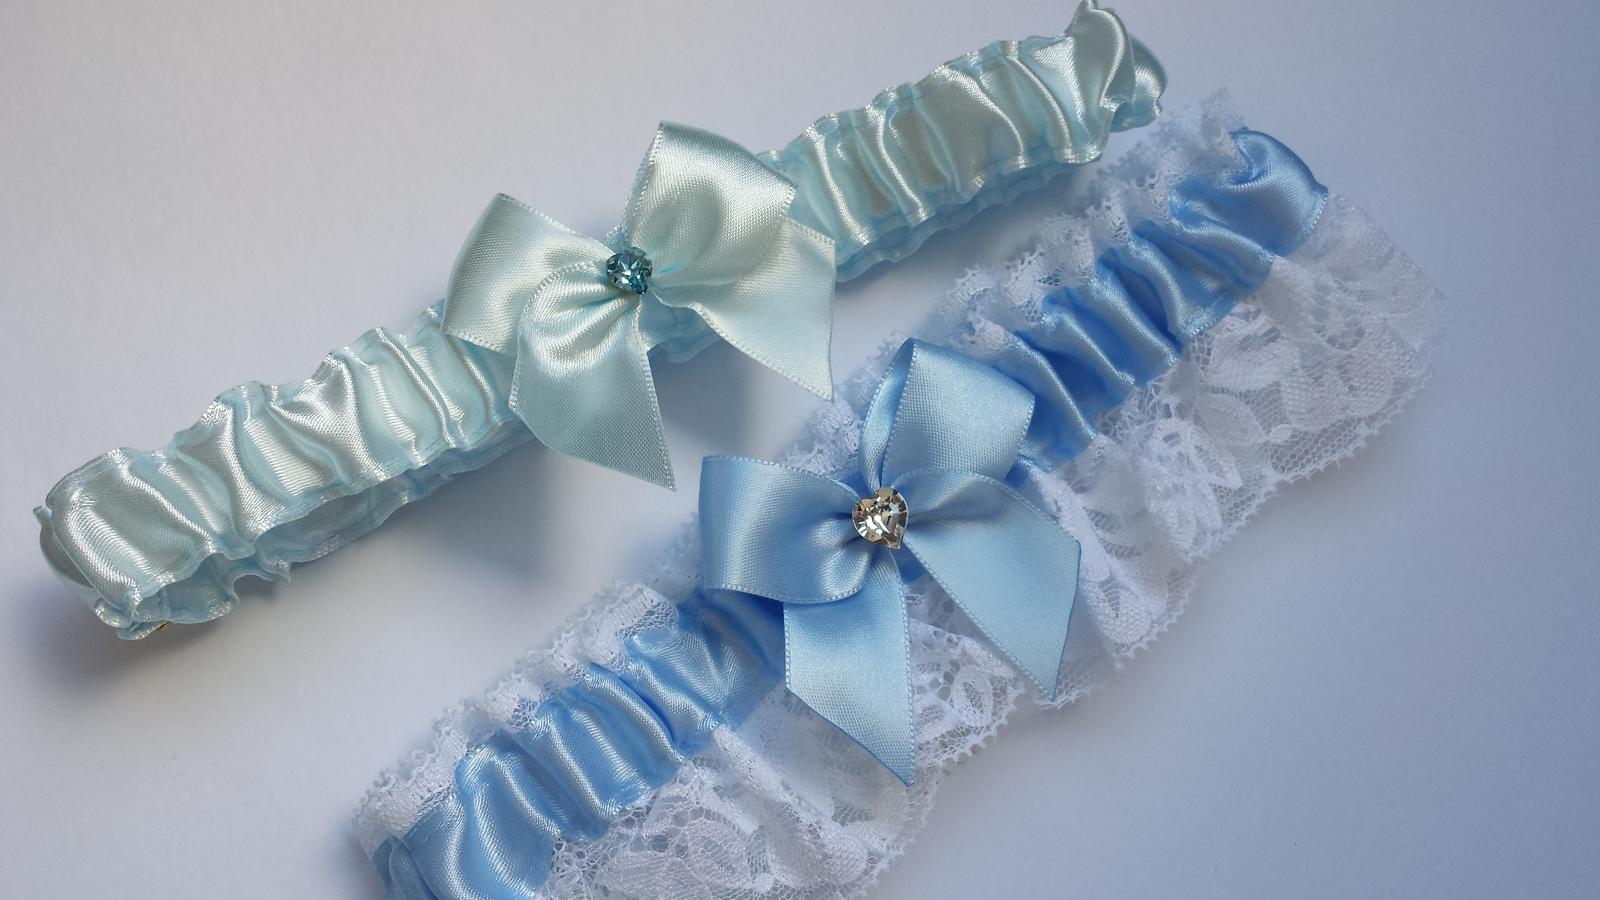 Sada  bílo/modrých SW podvazků - Obrázek č. 1